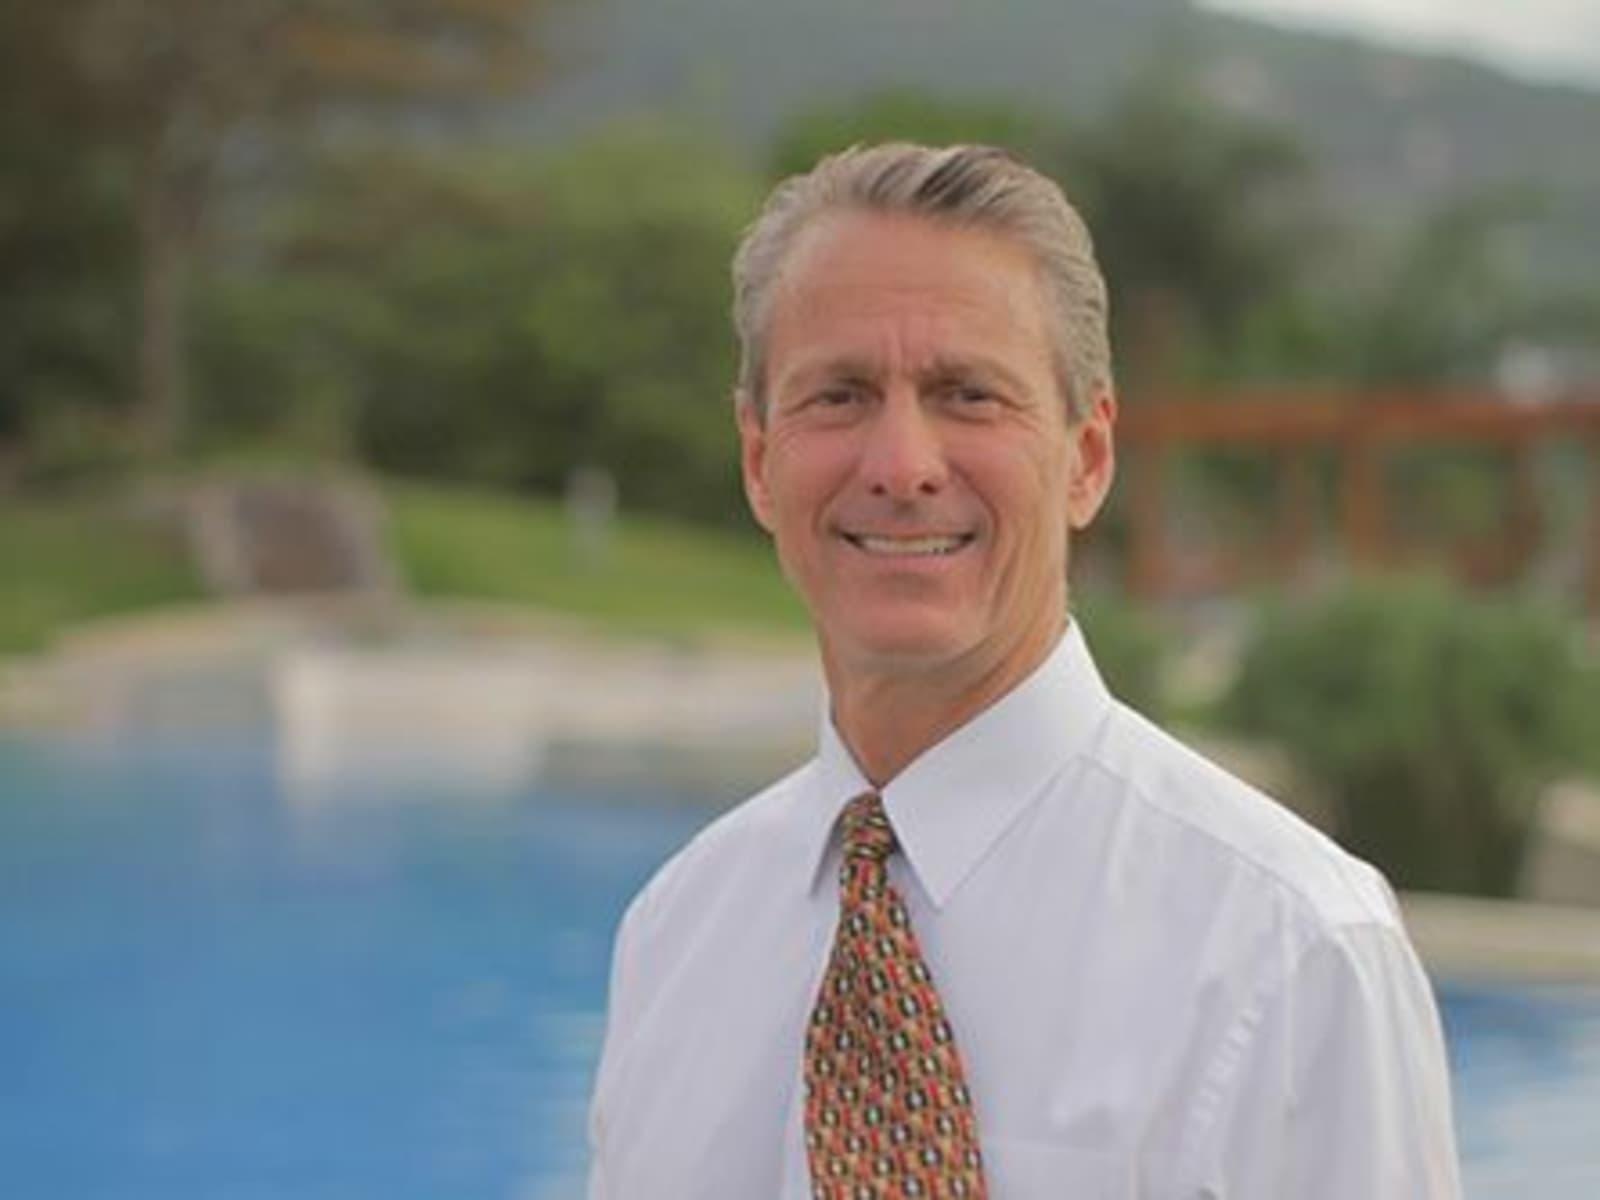 Scott from Santa Ana, Costa Rica